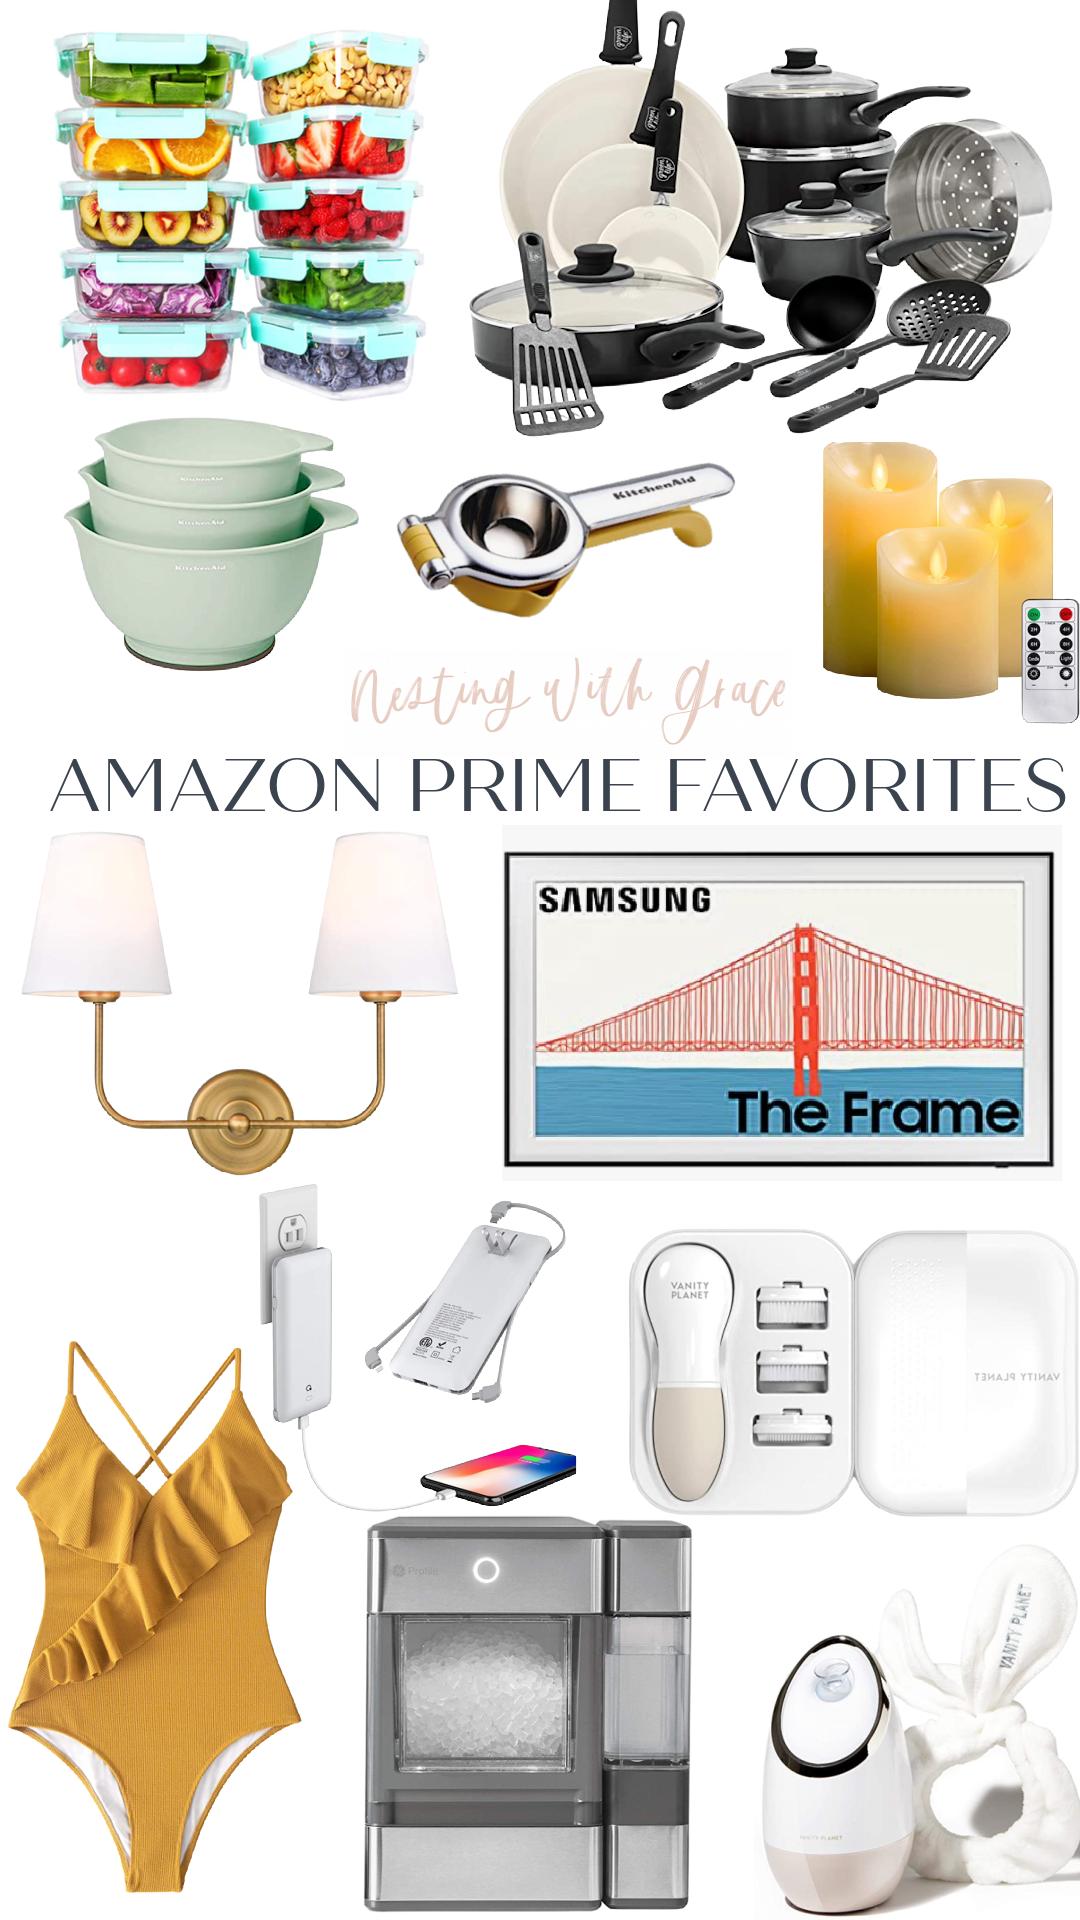 Amazon Prime Favorites